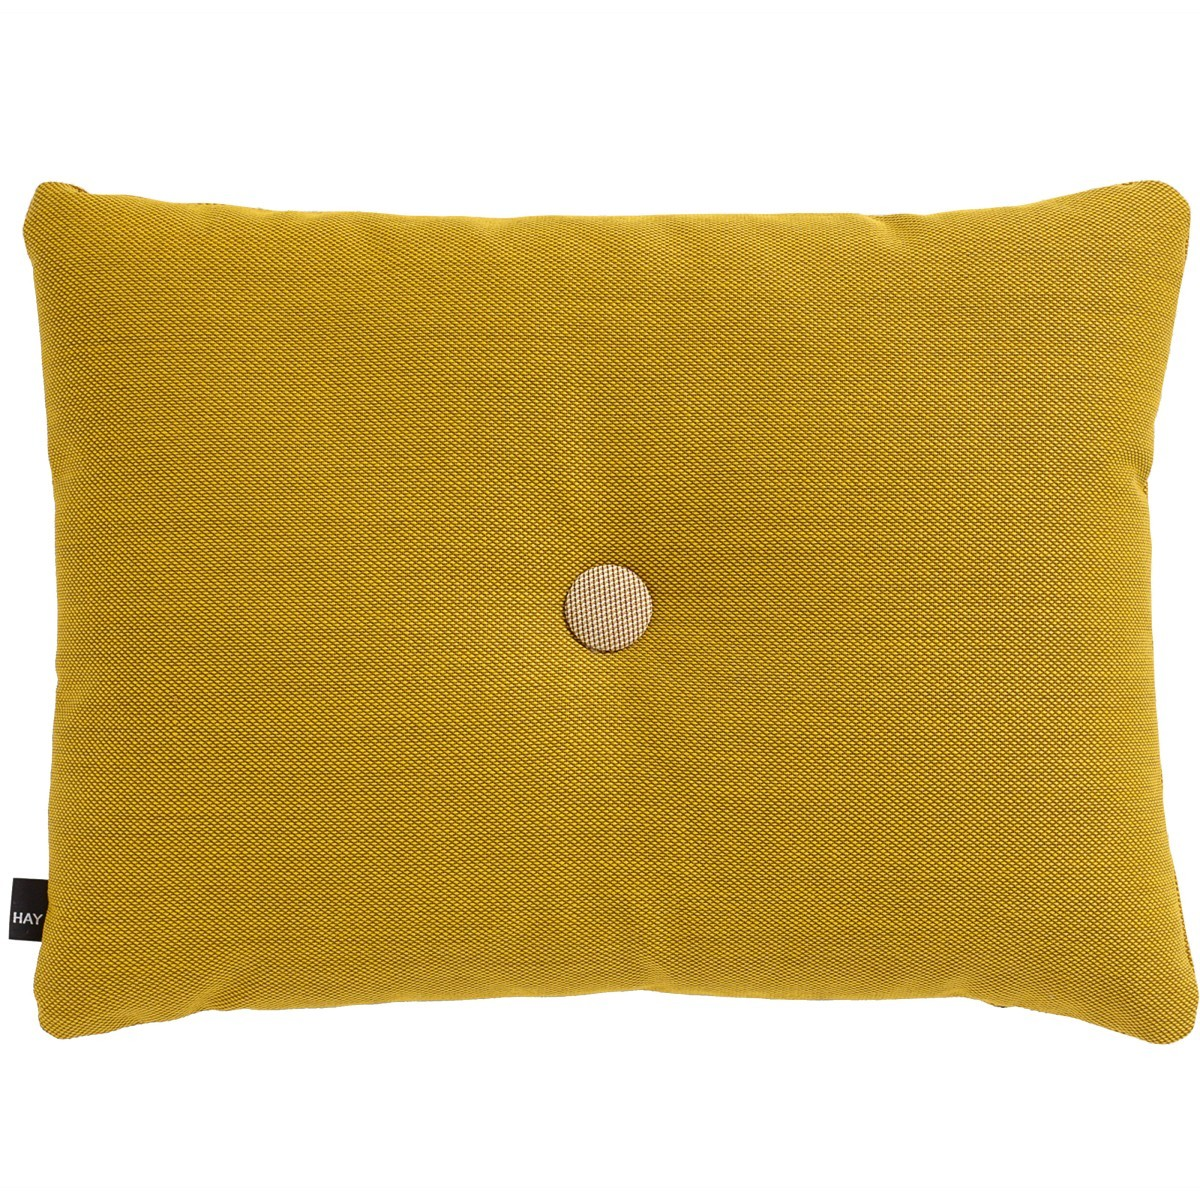 https://www.fundesign.nl/media/catalog/product/h/a/hay-dot-cushion-steelcut-trio-goud.jpg